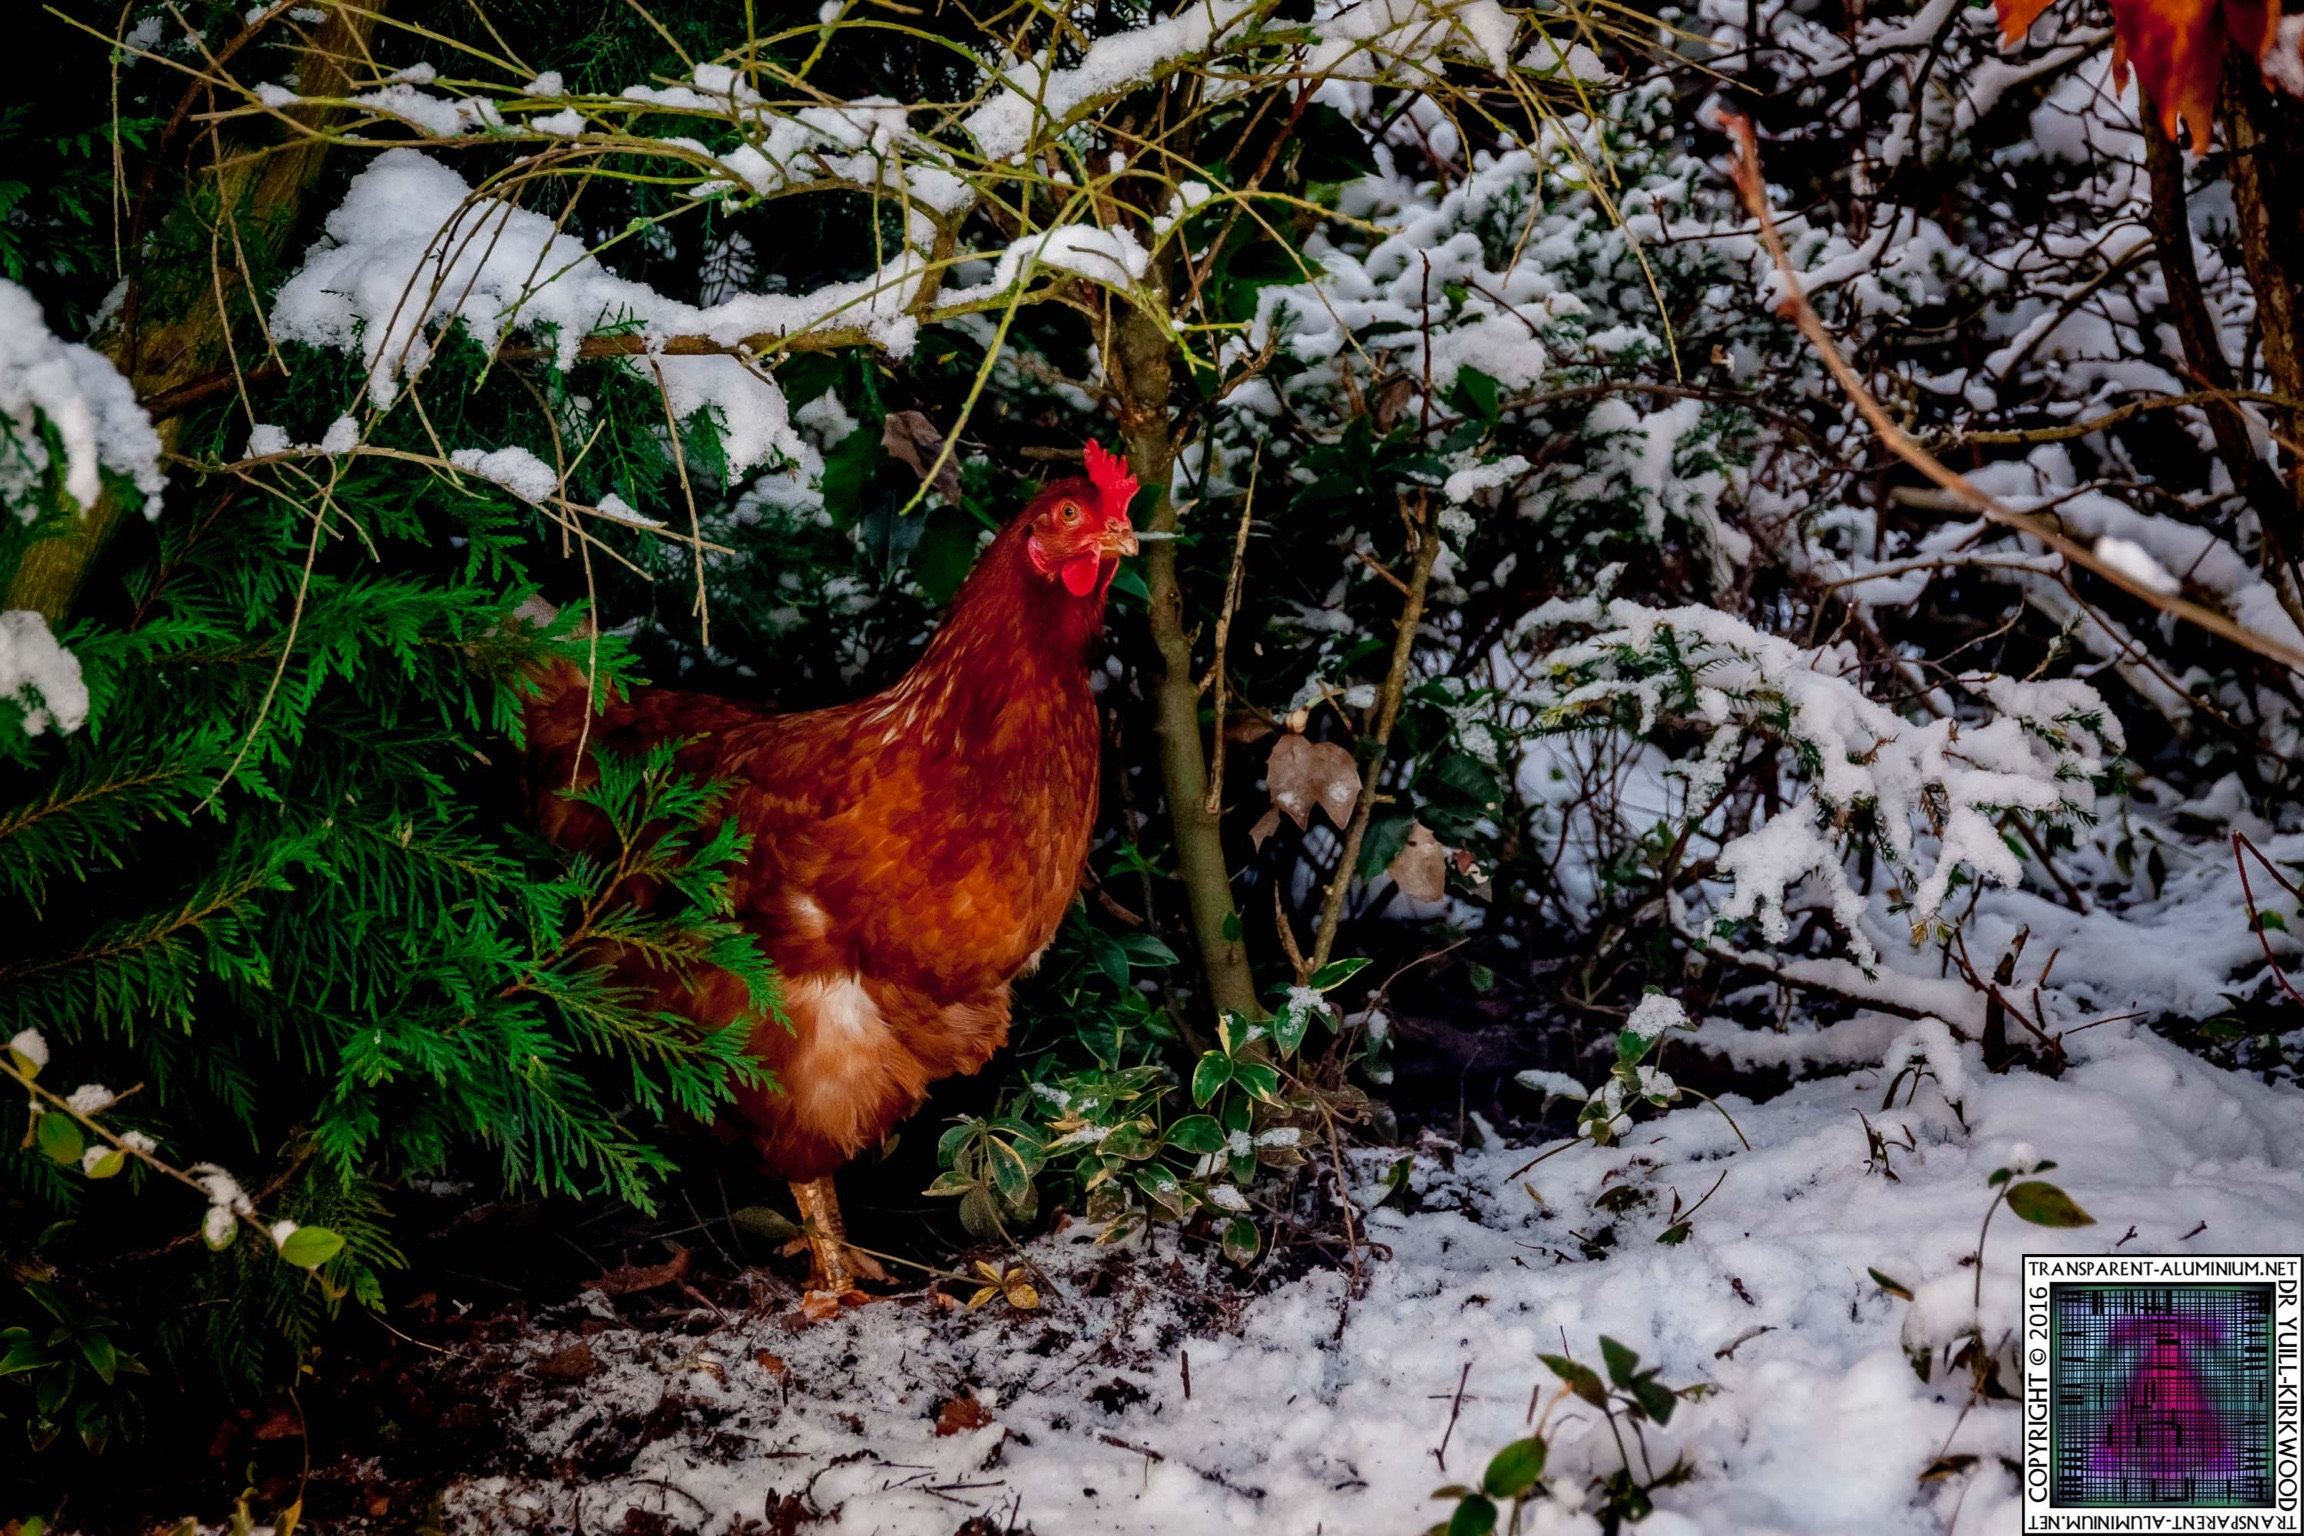 Paxo Hiding In The Snow